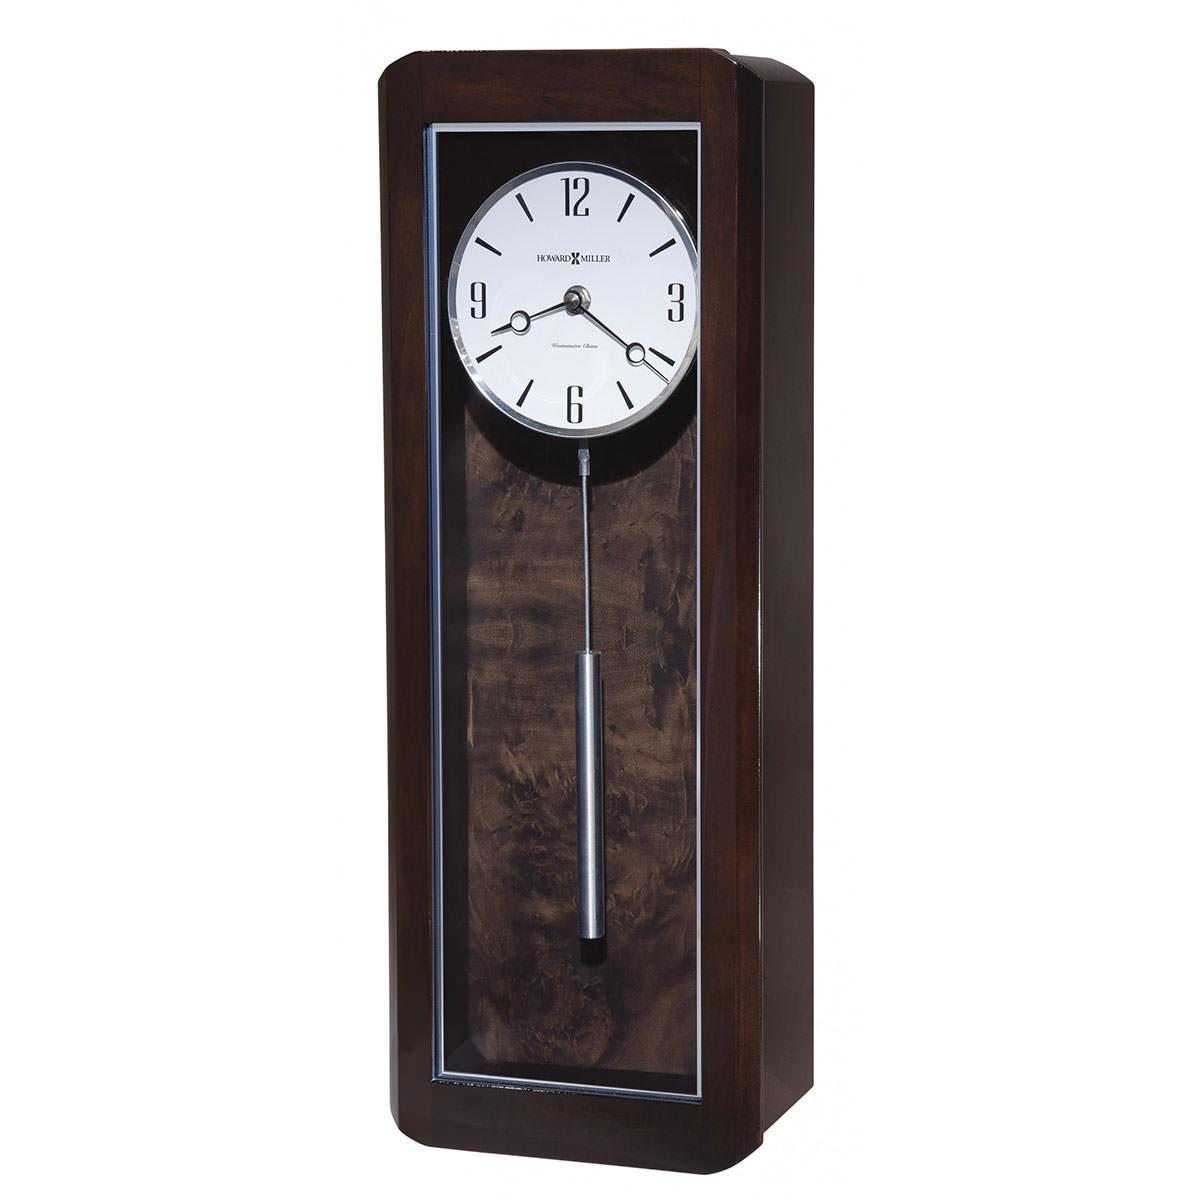 625 583 Aaron Wall Clock By Howard Miller